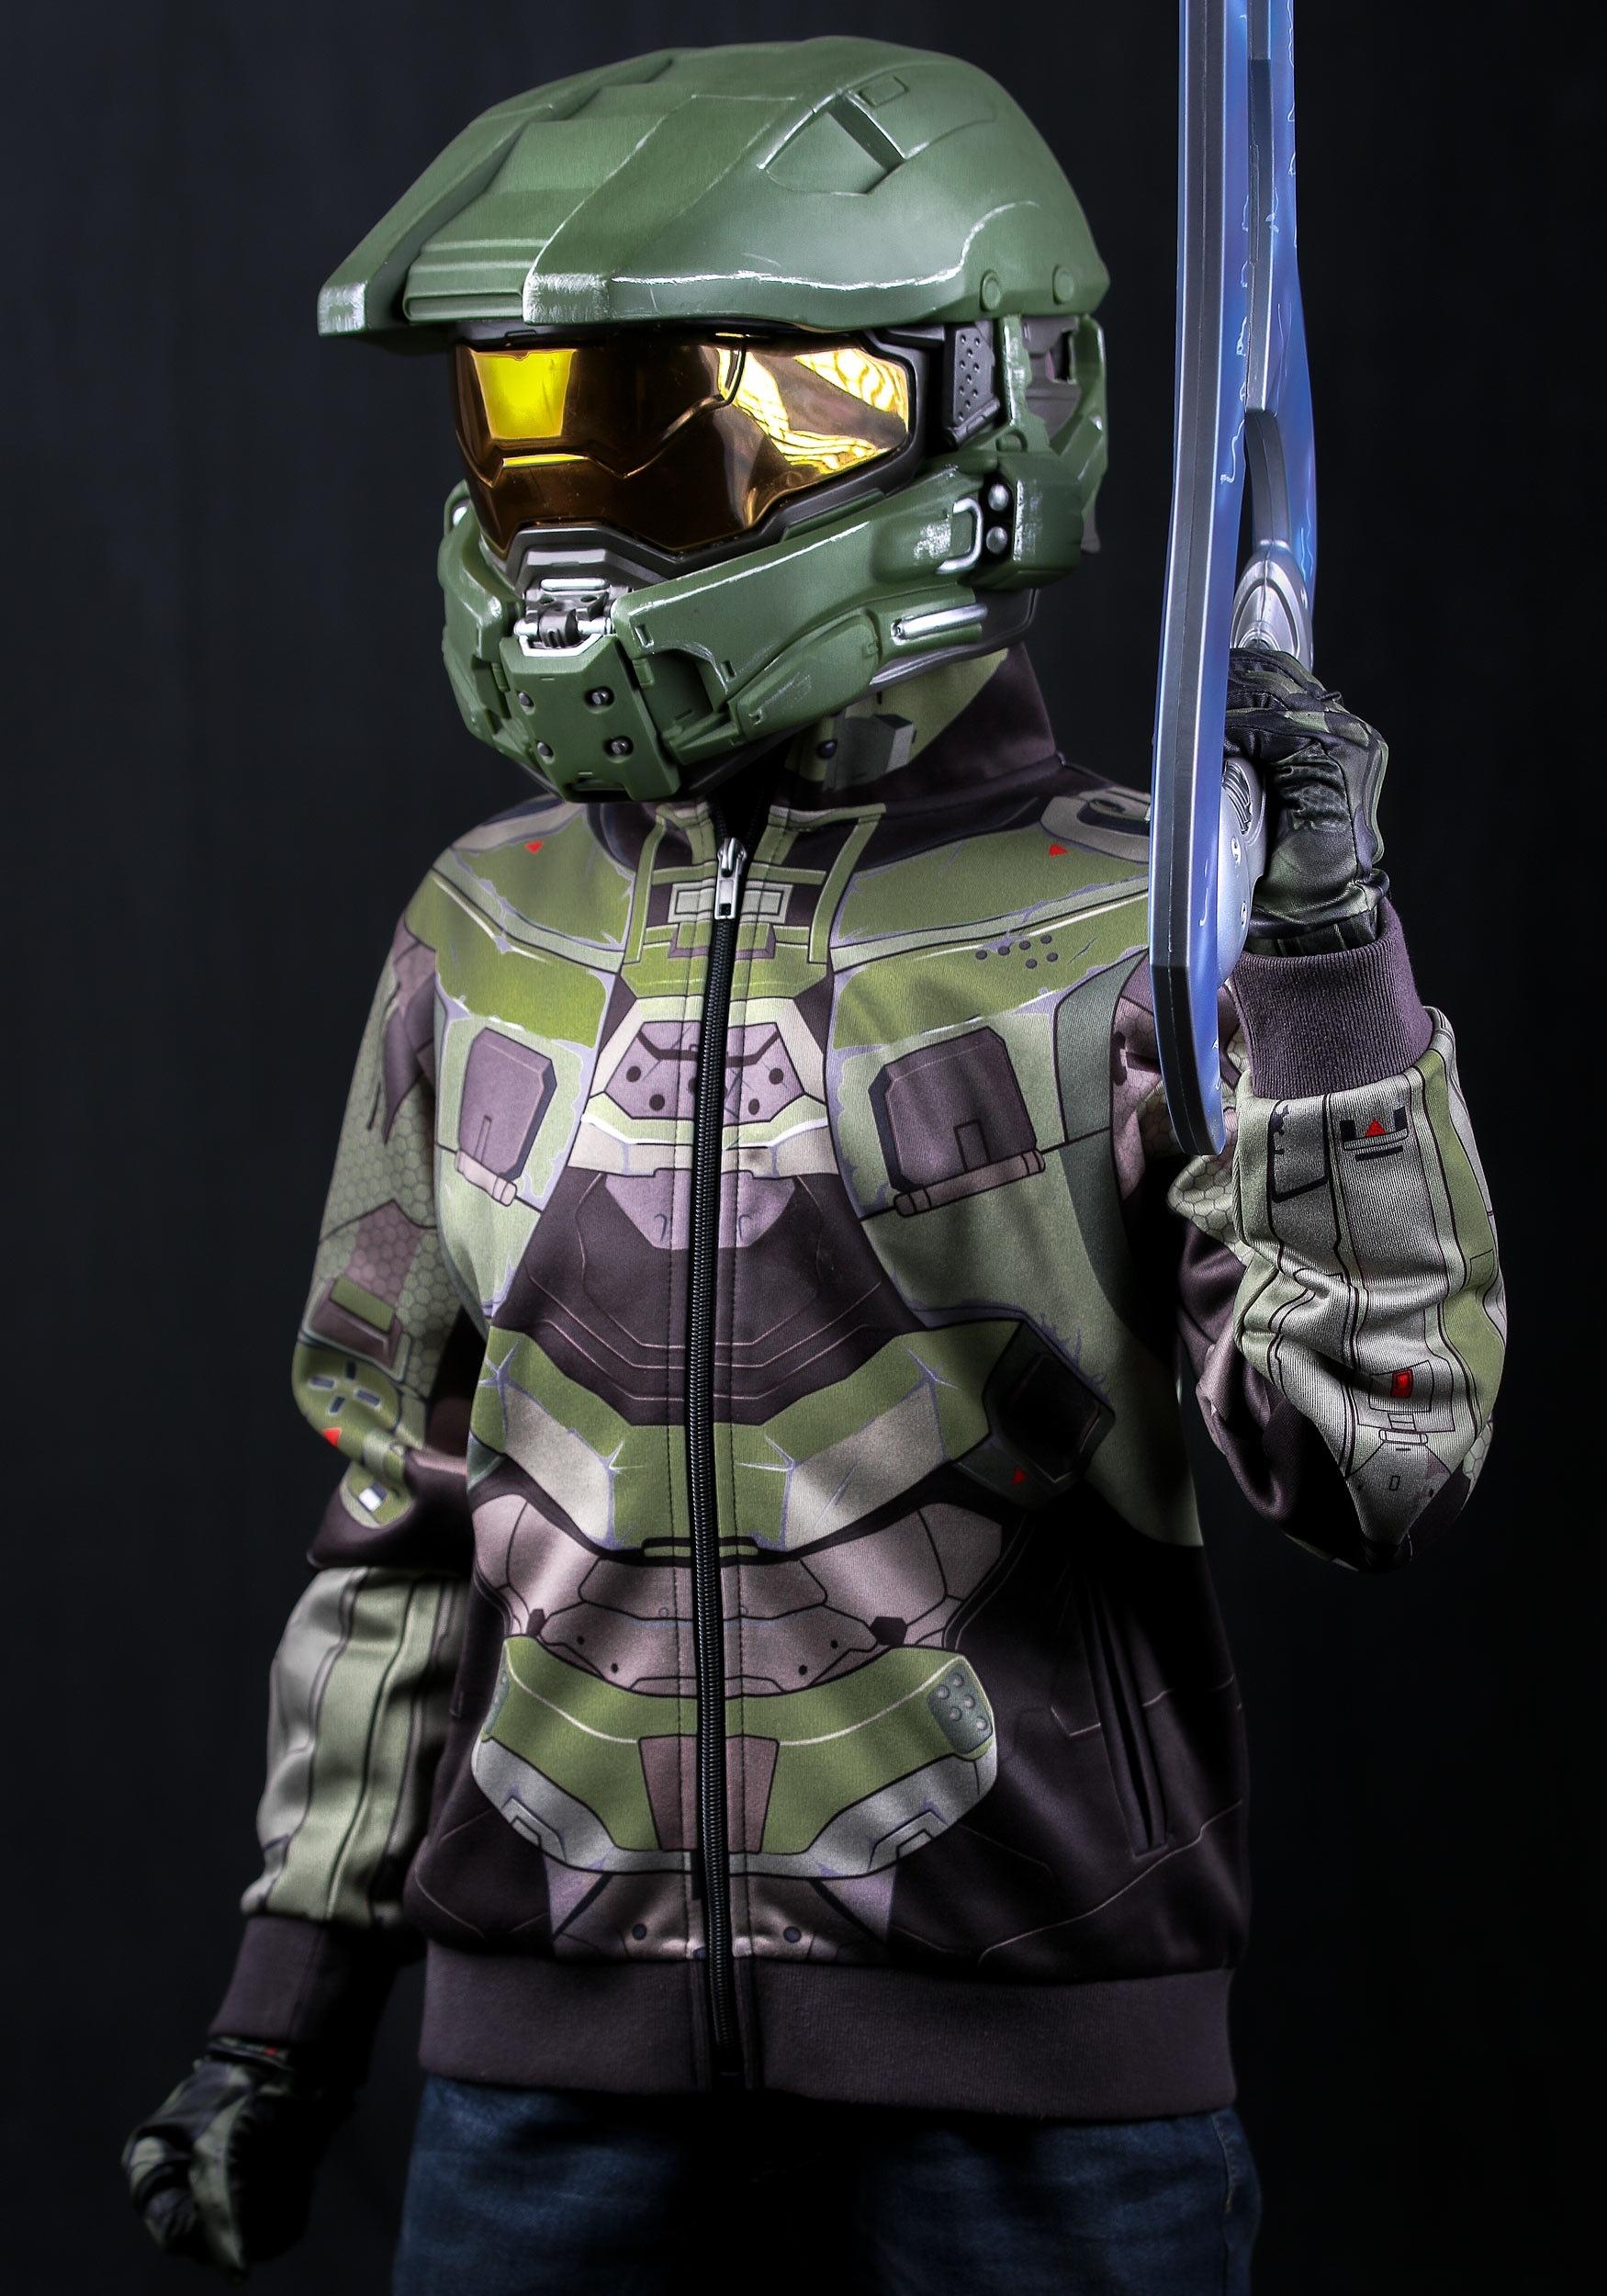 Halo Kid Costumes & Halo Costume Sc 1 St BuyNeu